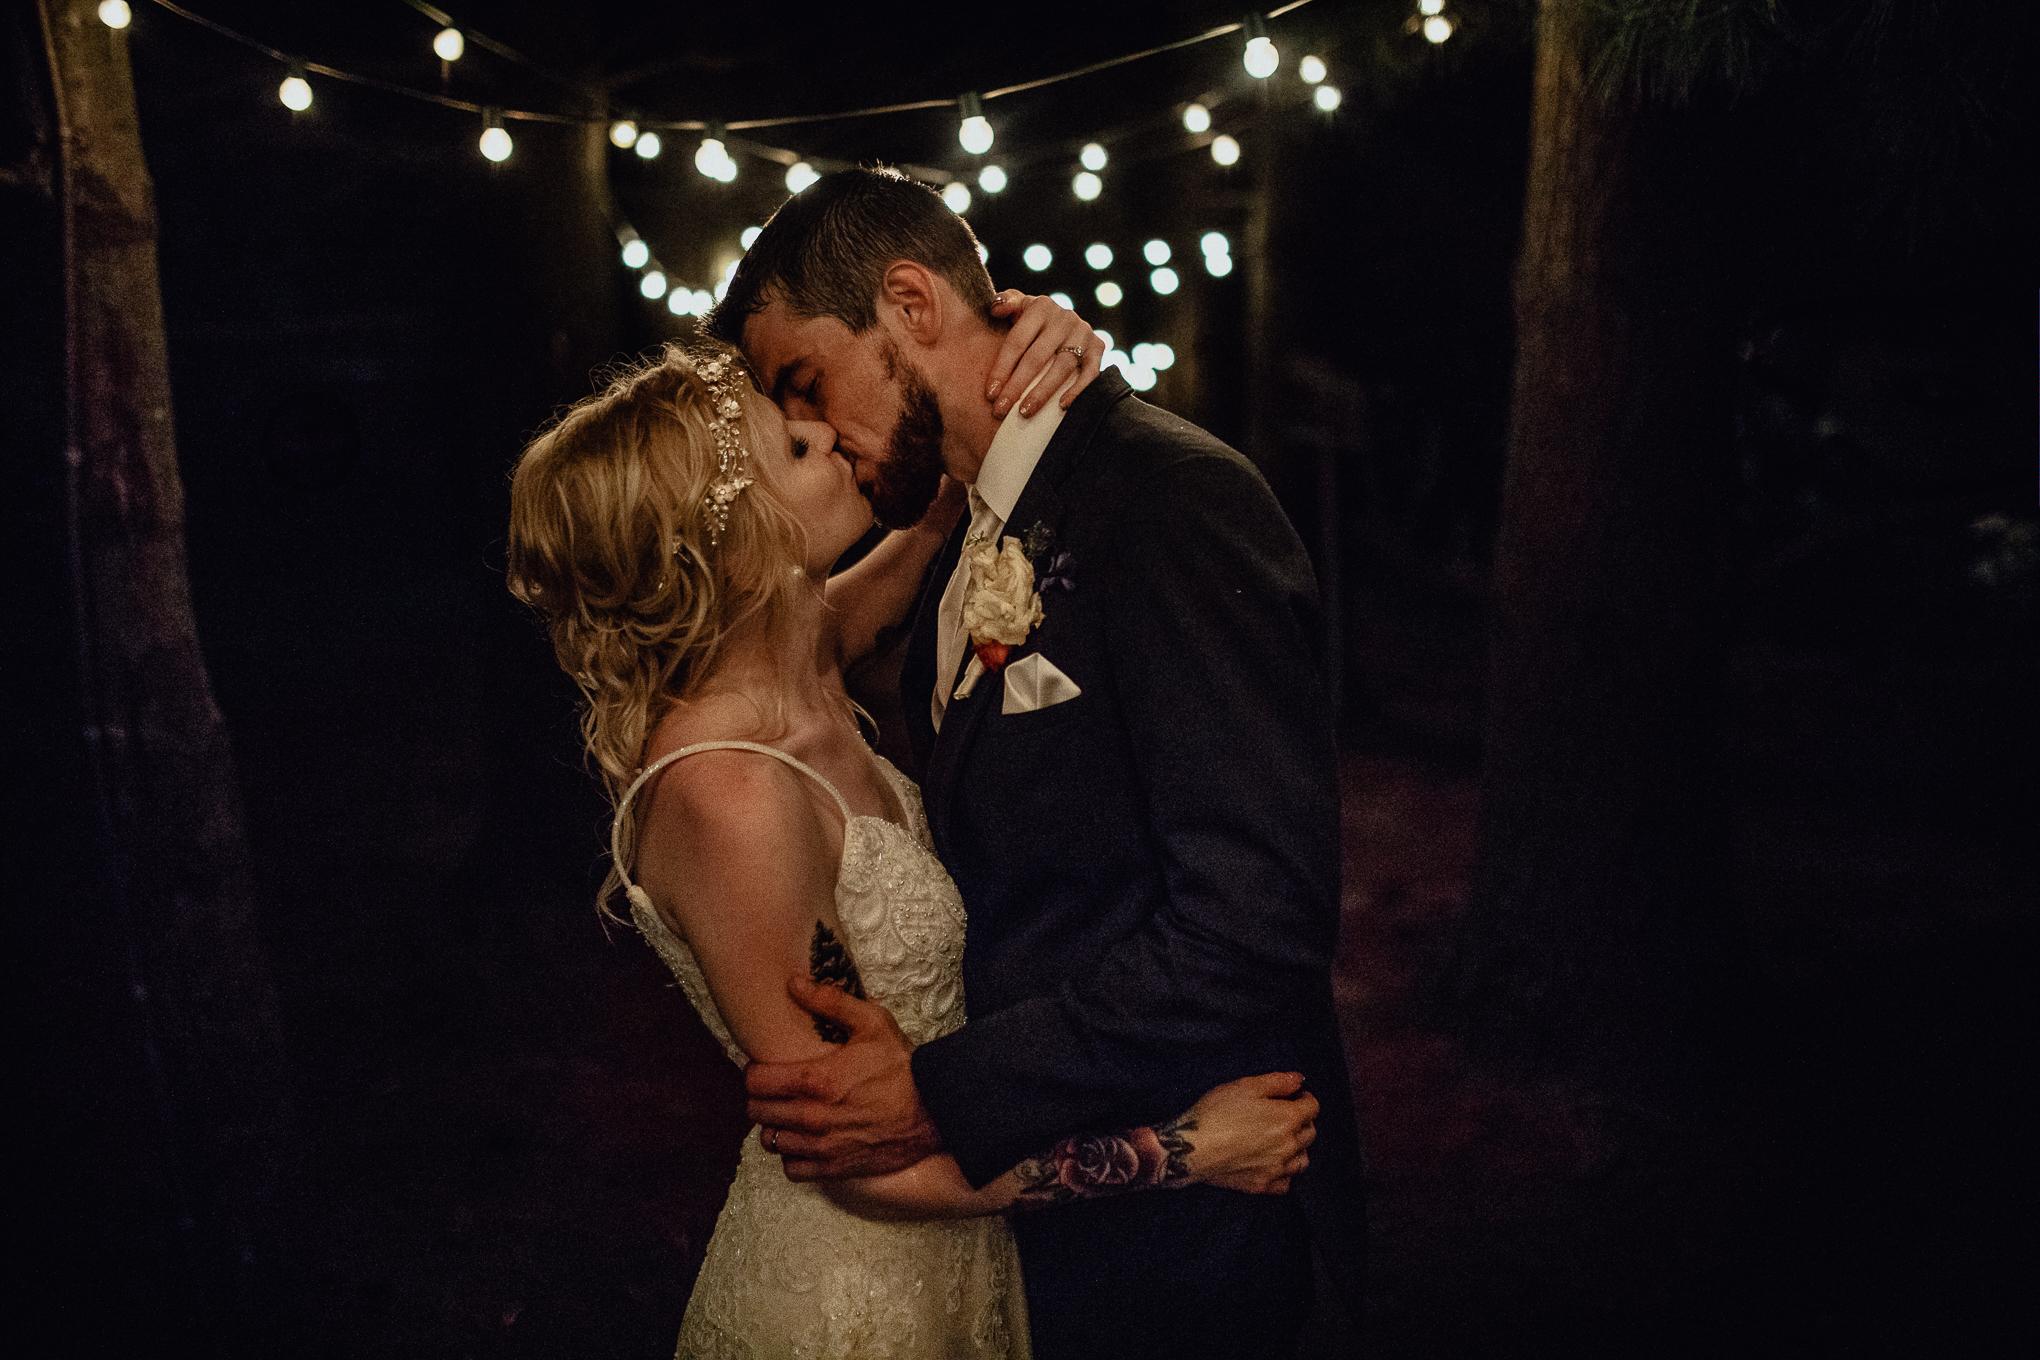 wedding-couple-kissing-under-string-lights.jpg